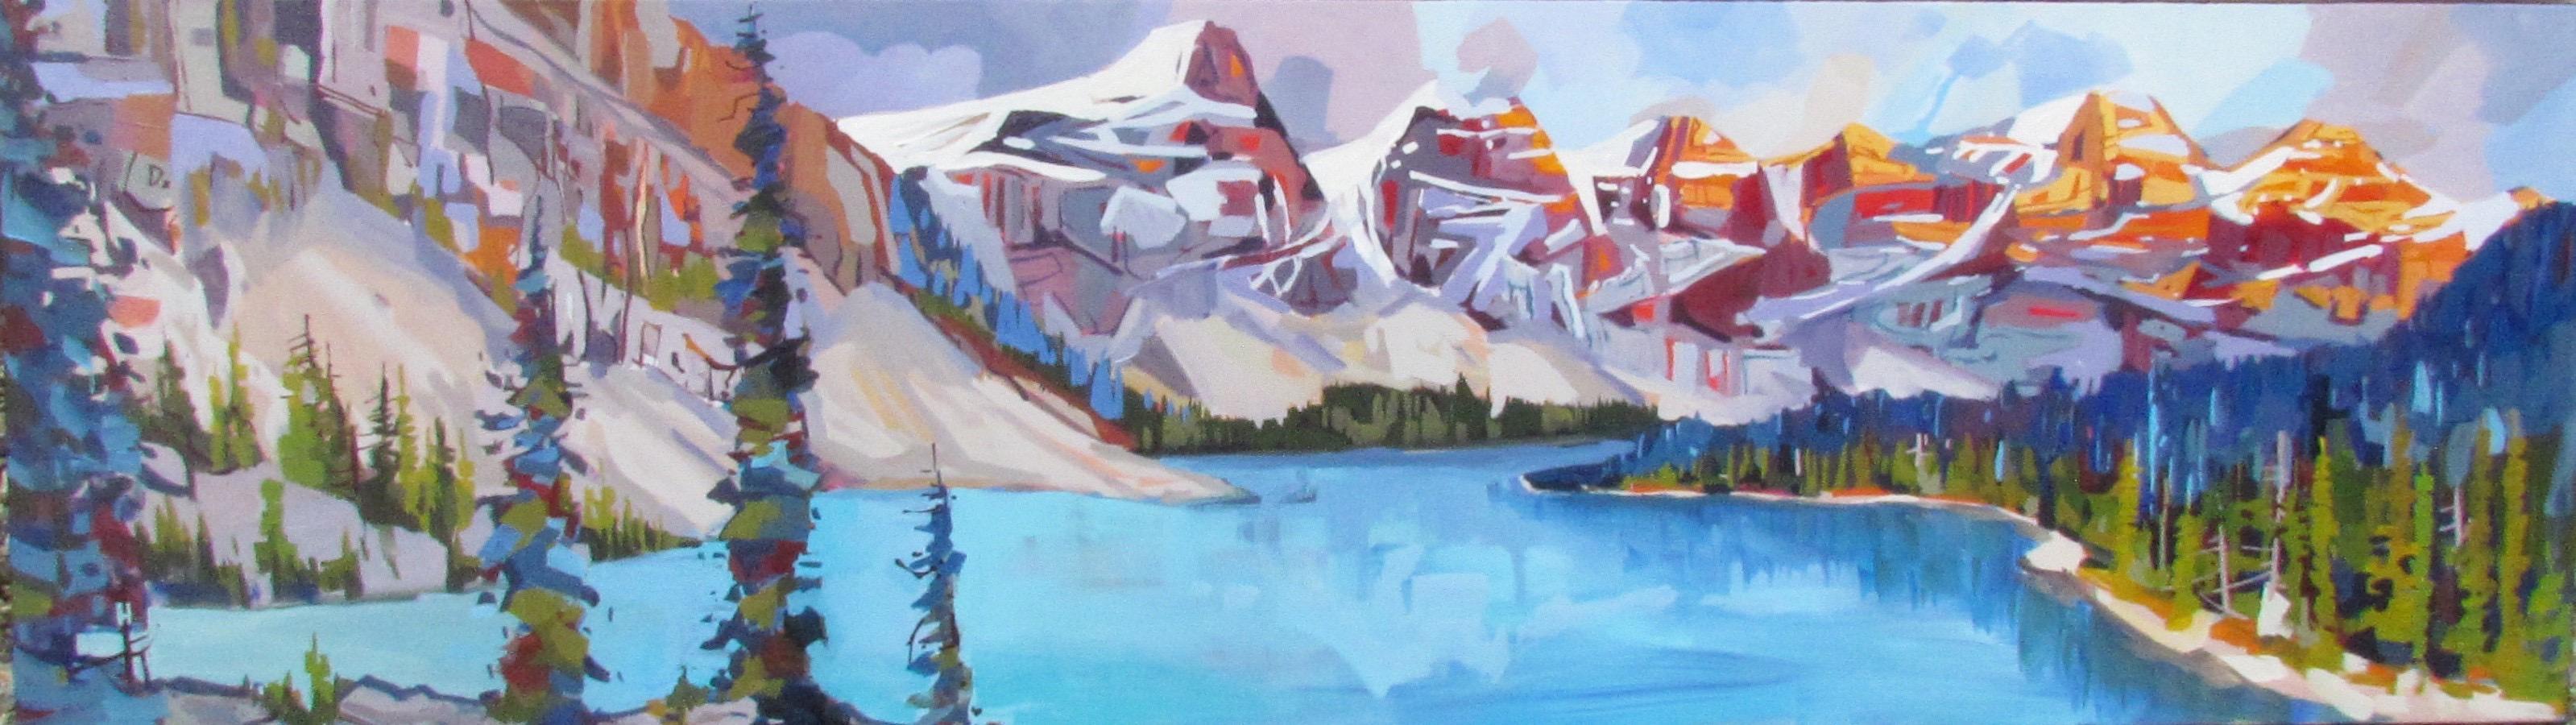 Paintings by Rick Bond